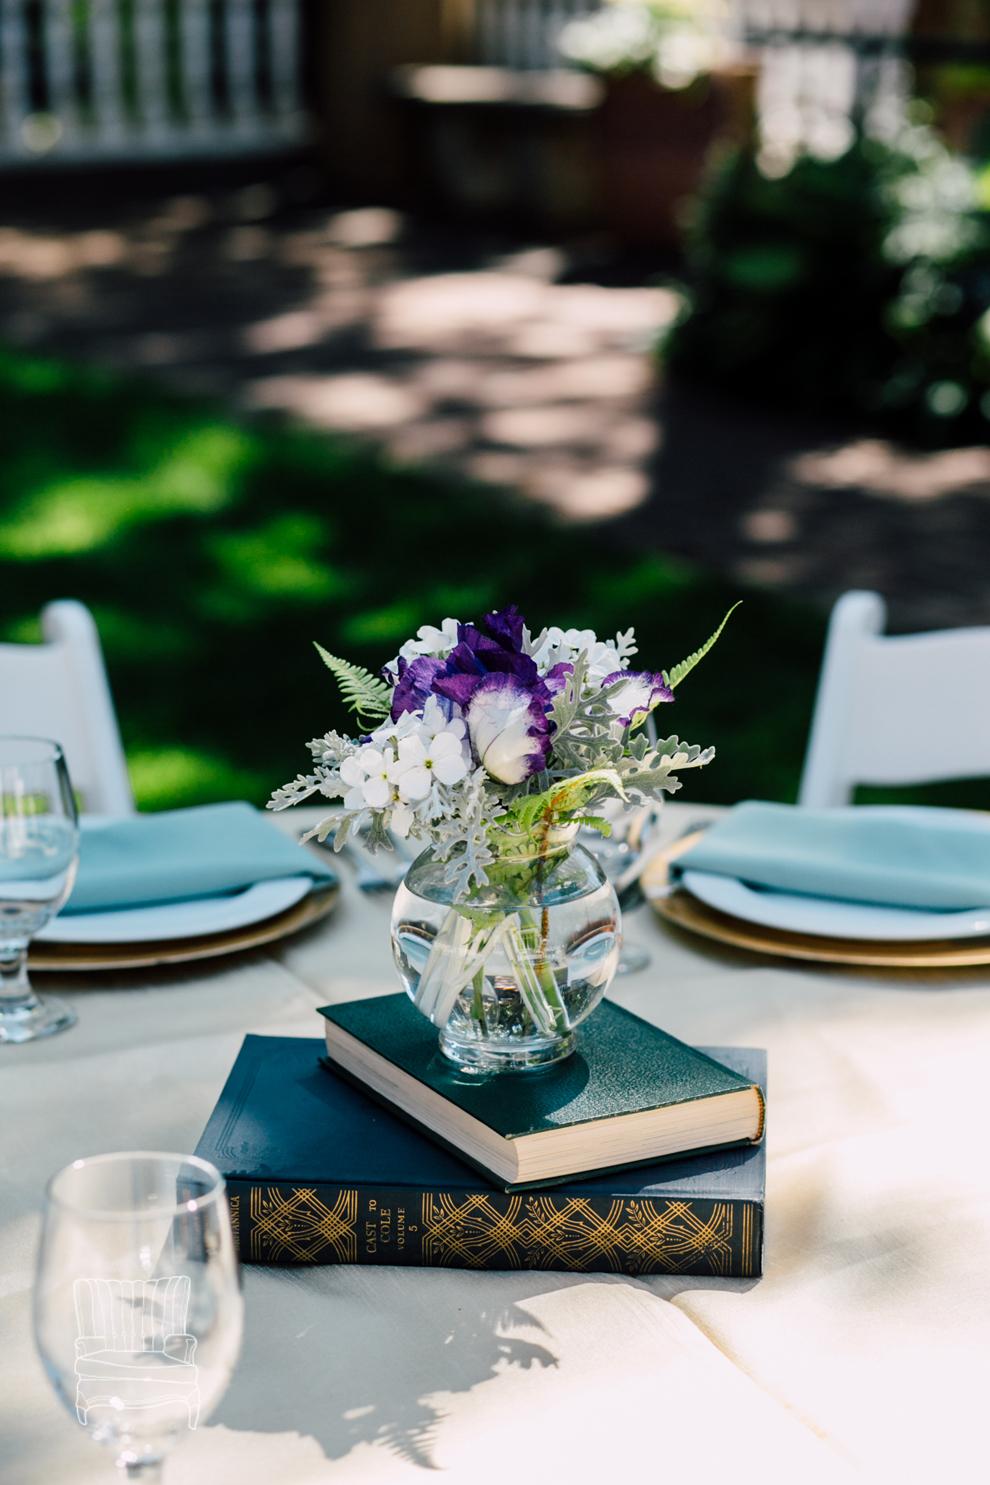 010-lairmont-manor-bellingham-washington-wedding-venue-katheryn-moran-photography-marketing.jpg